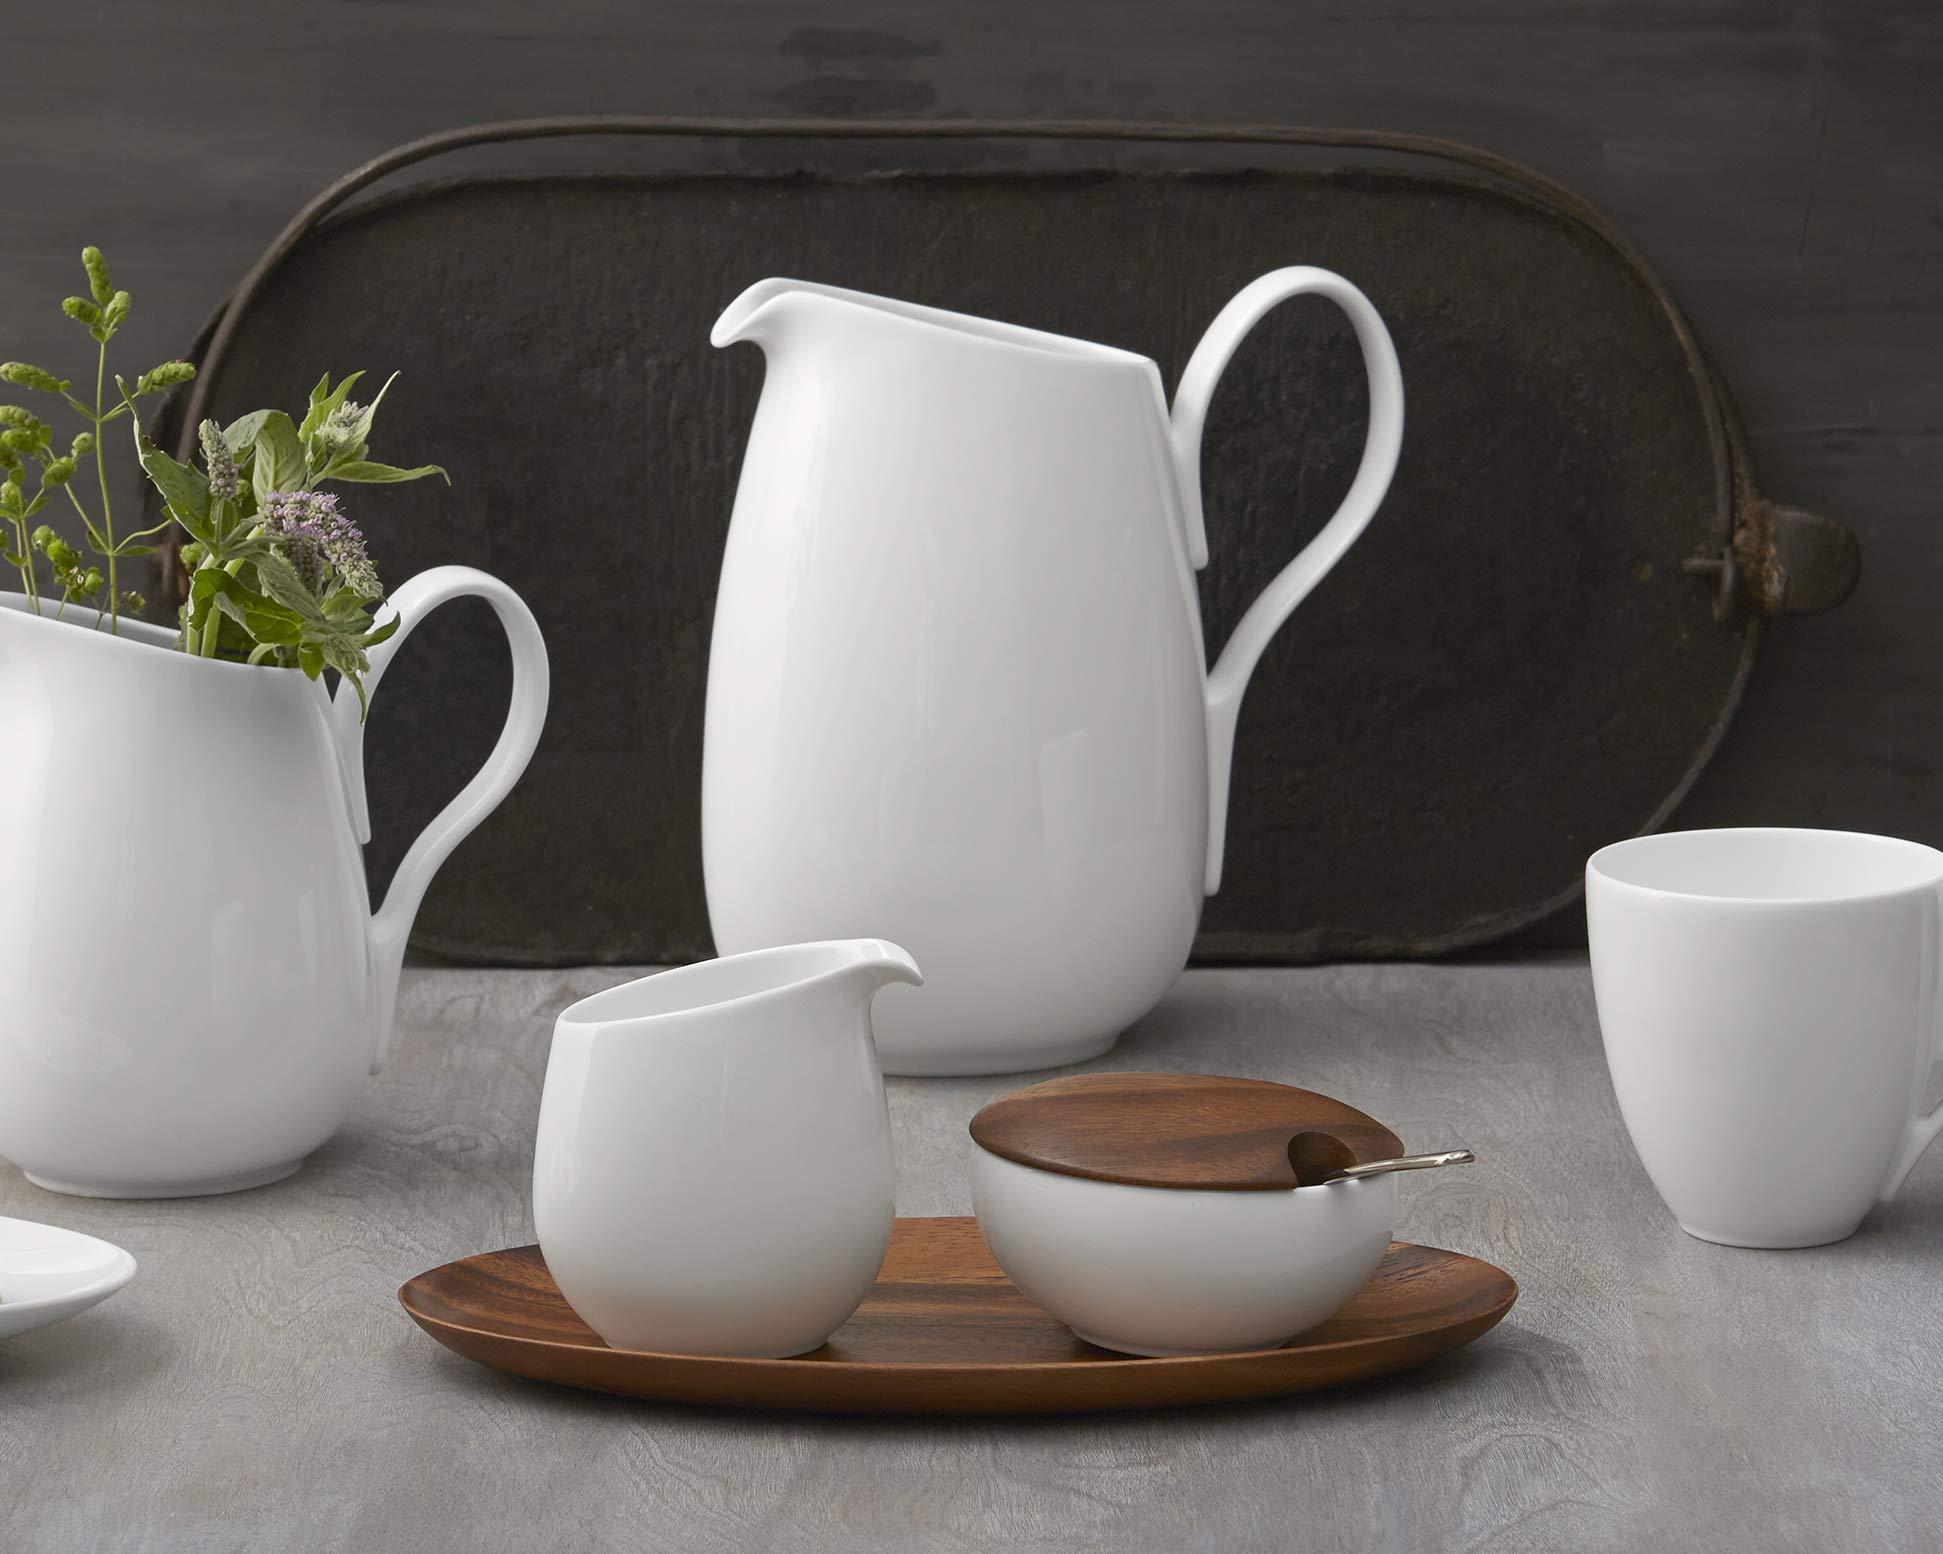 Nambé MT0866 Skye Sugar Creamer Set, Bowl: 4.5'' L x 3'' W x 2.75'' H, (1) Pitcher: 3.5'' L x 2.75'' W x 4'' H, (1) Serving Tray: 11.25'' L x 5.25'' W x 0.75'' H, White by Nambé (Image #2)